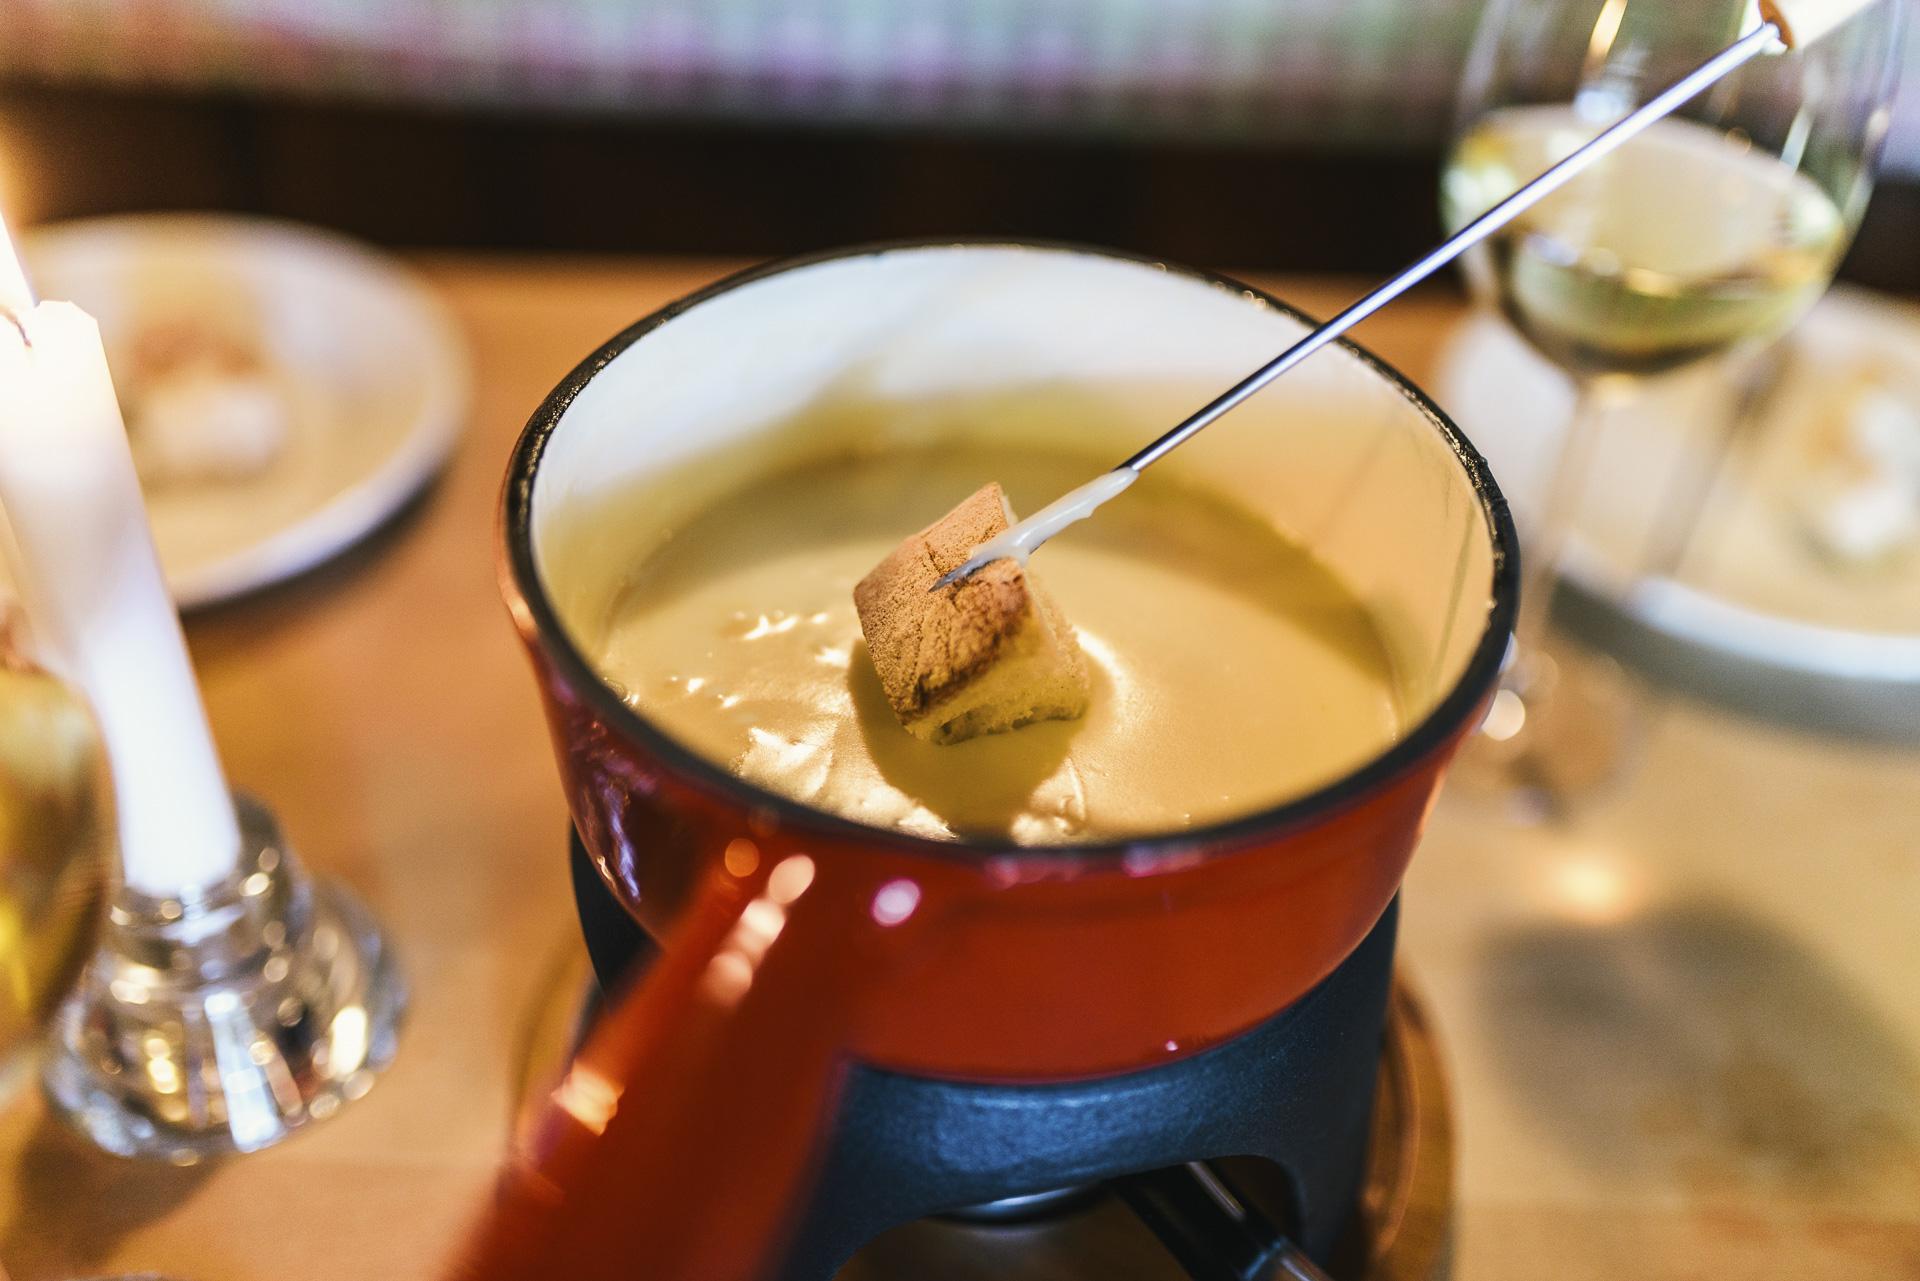 fondue und raclette in freiburg busses waldcafe. Black Bedroom Furniture Sets. Home Design Ideas